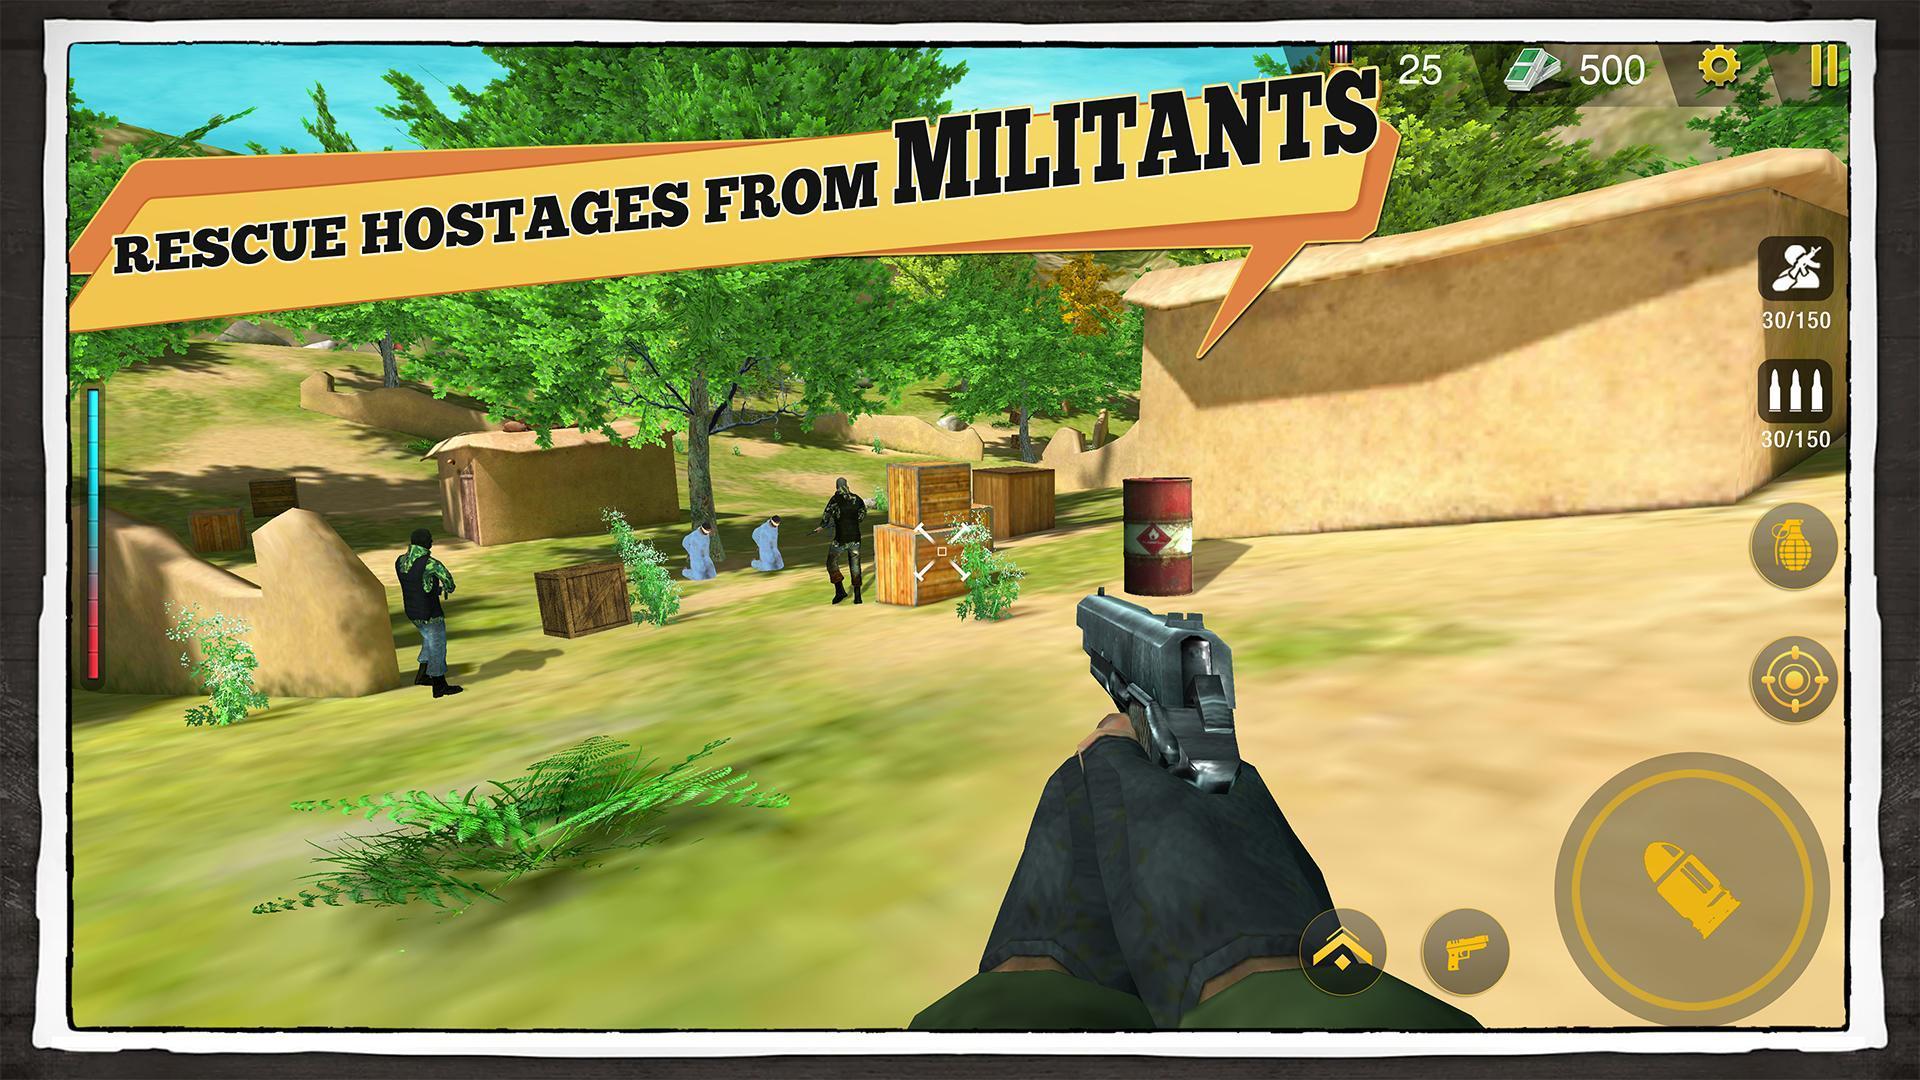 Yalghaar Delta IGI Commando Adventure Mobile Game 3.4 Screenshot 2